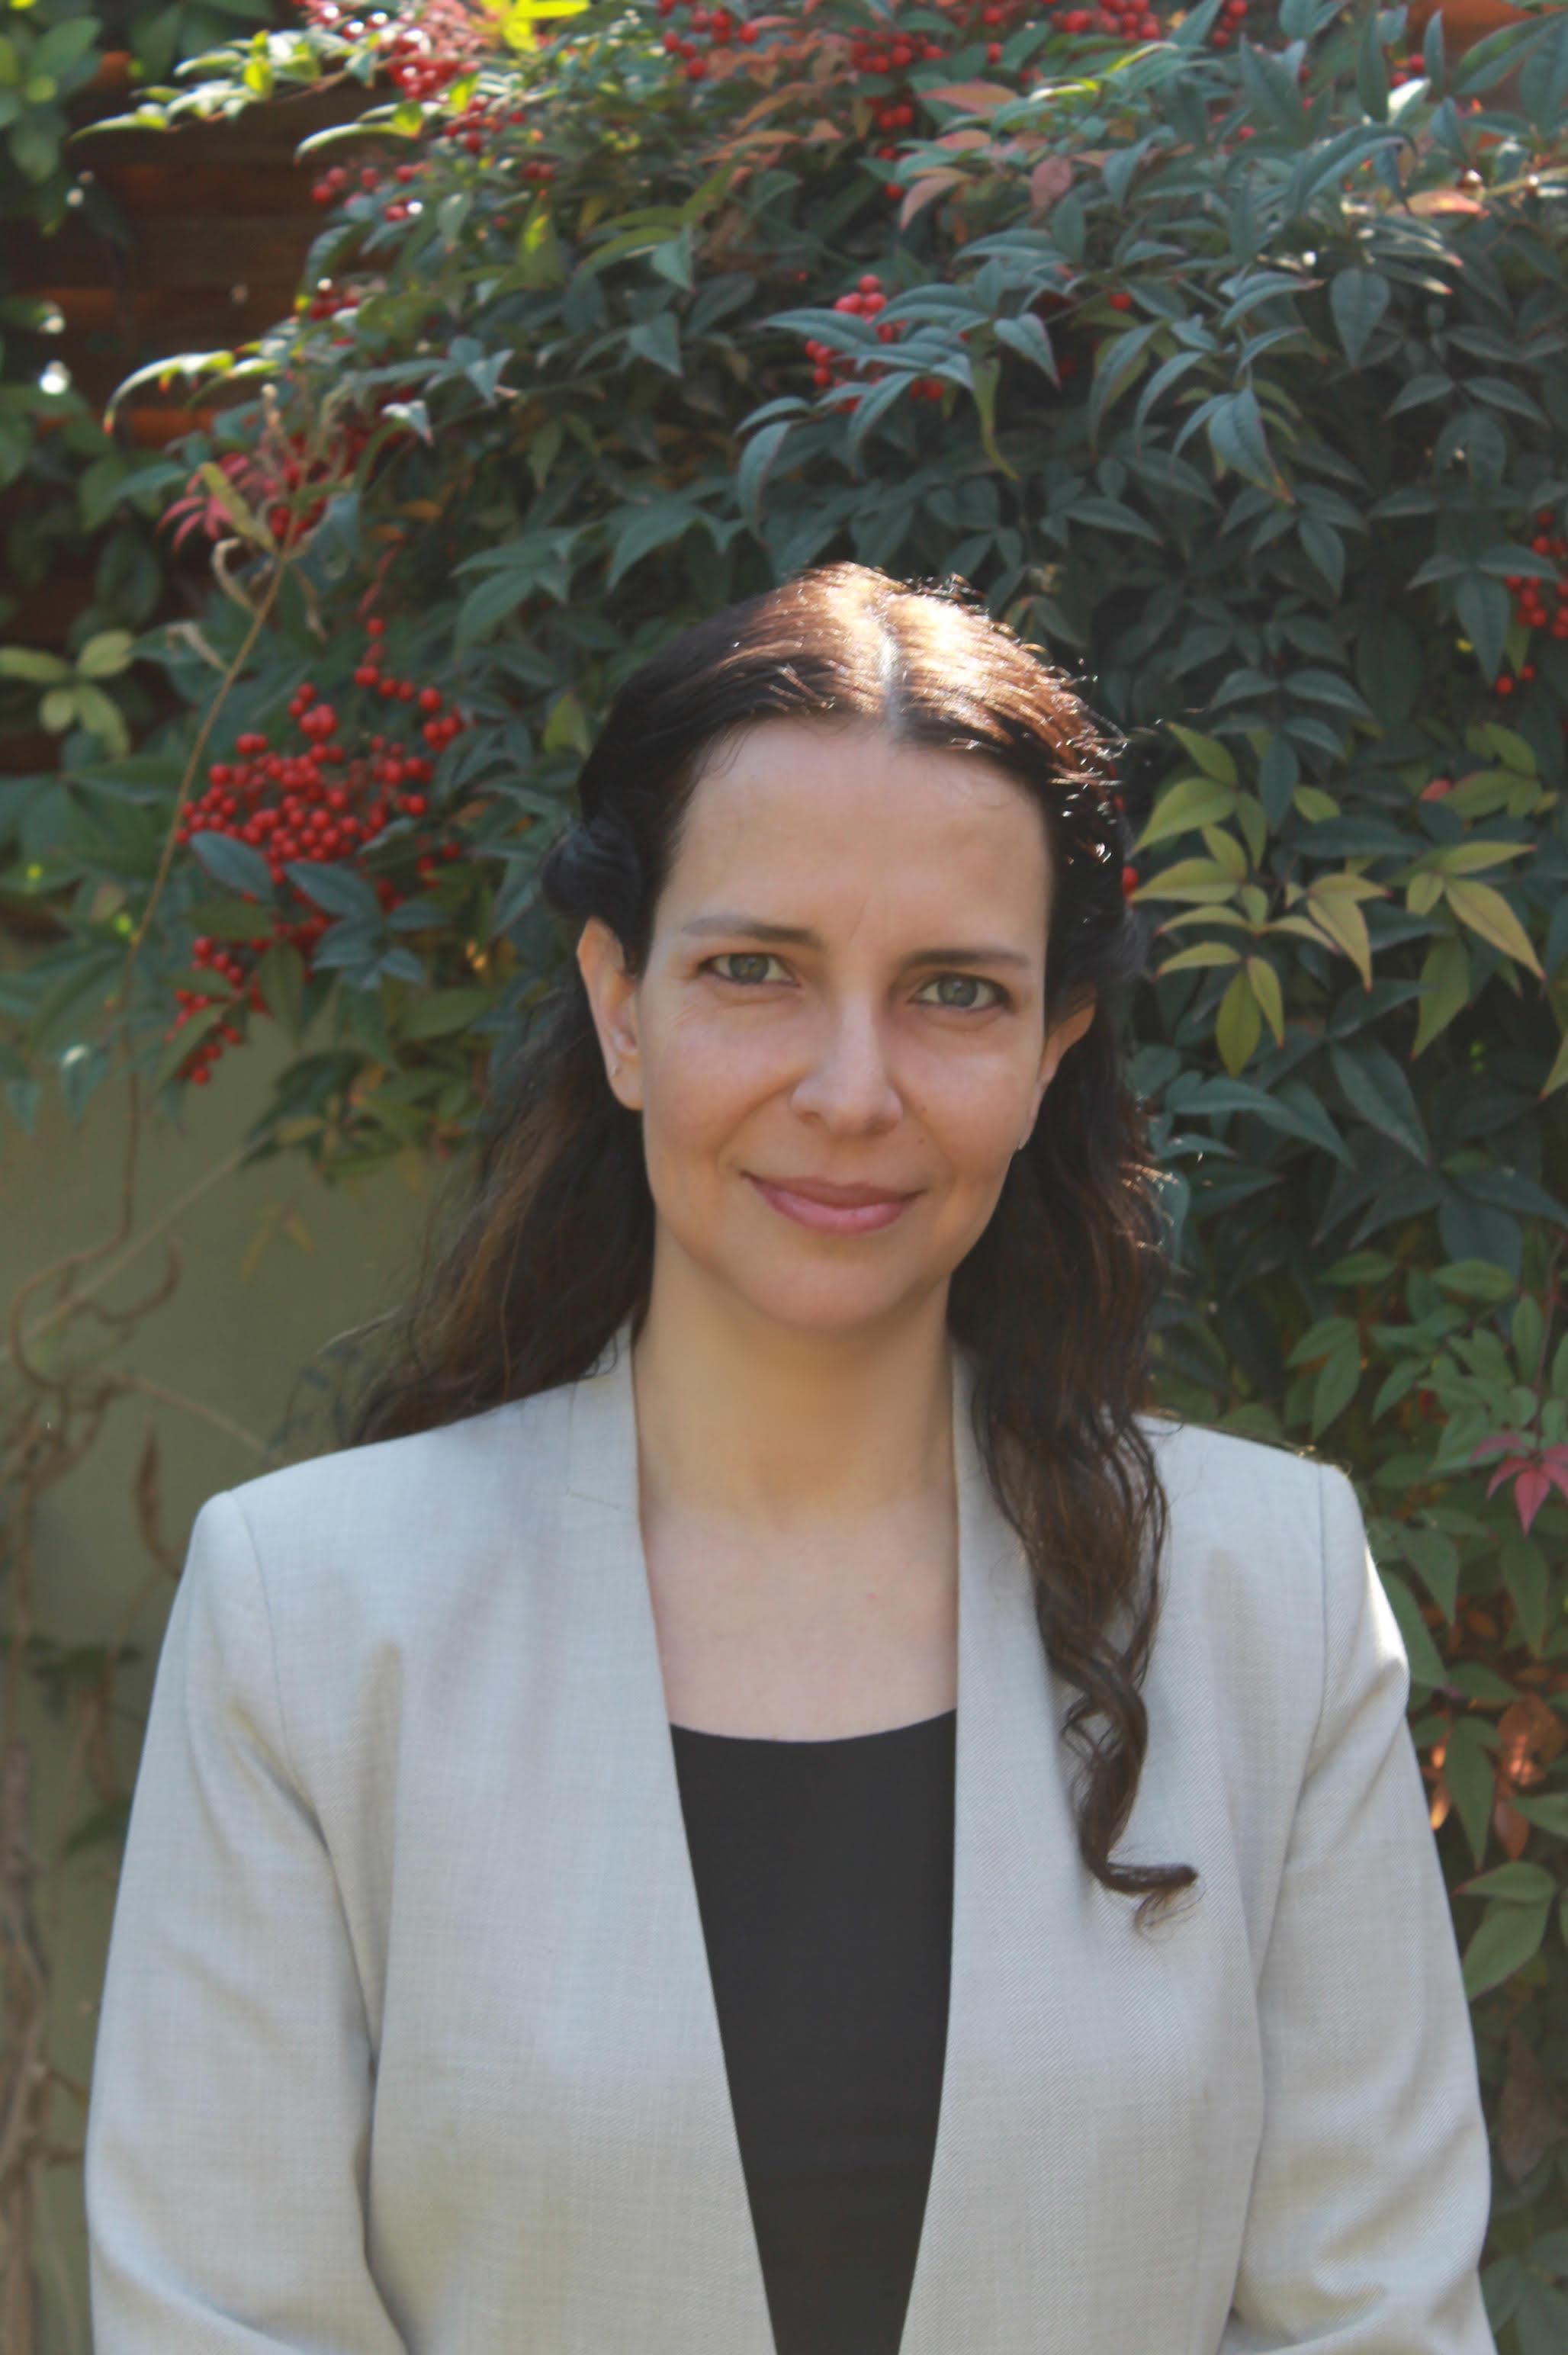 Dra. Loreto Marró Freitte